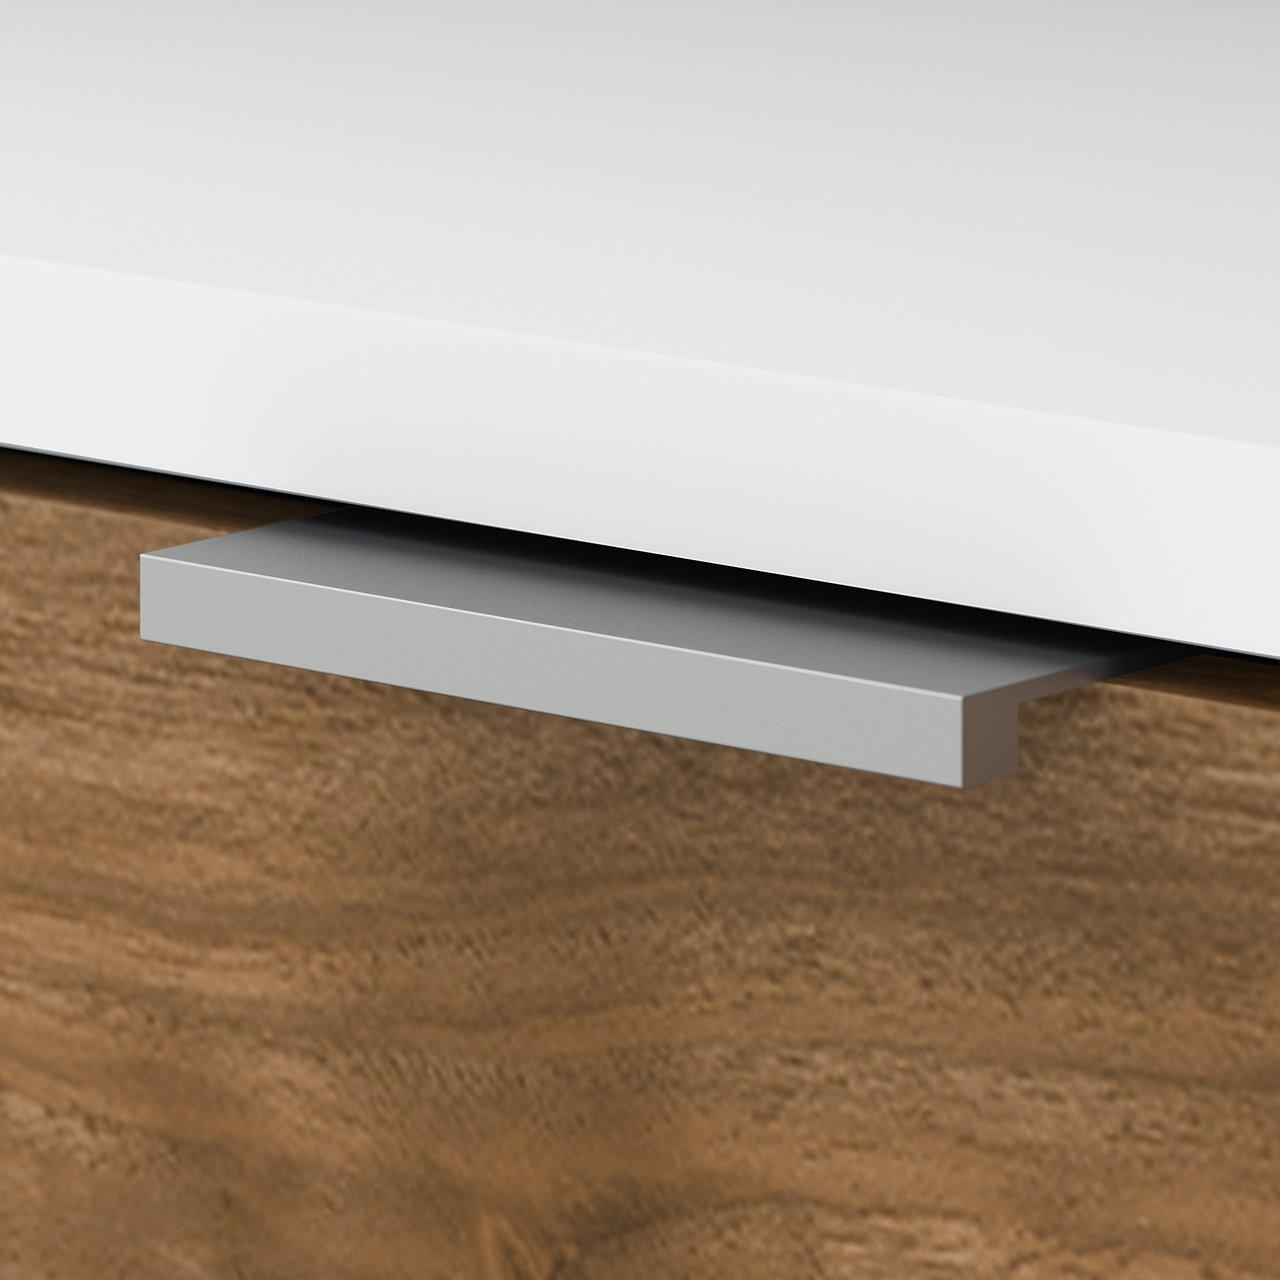 jamestown pedestal drawer handle